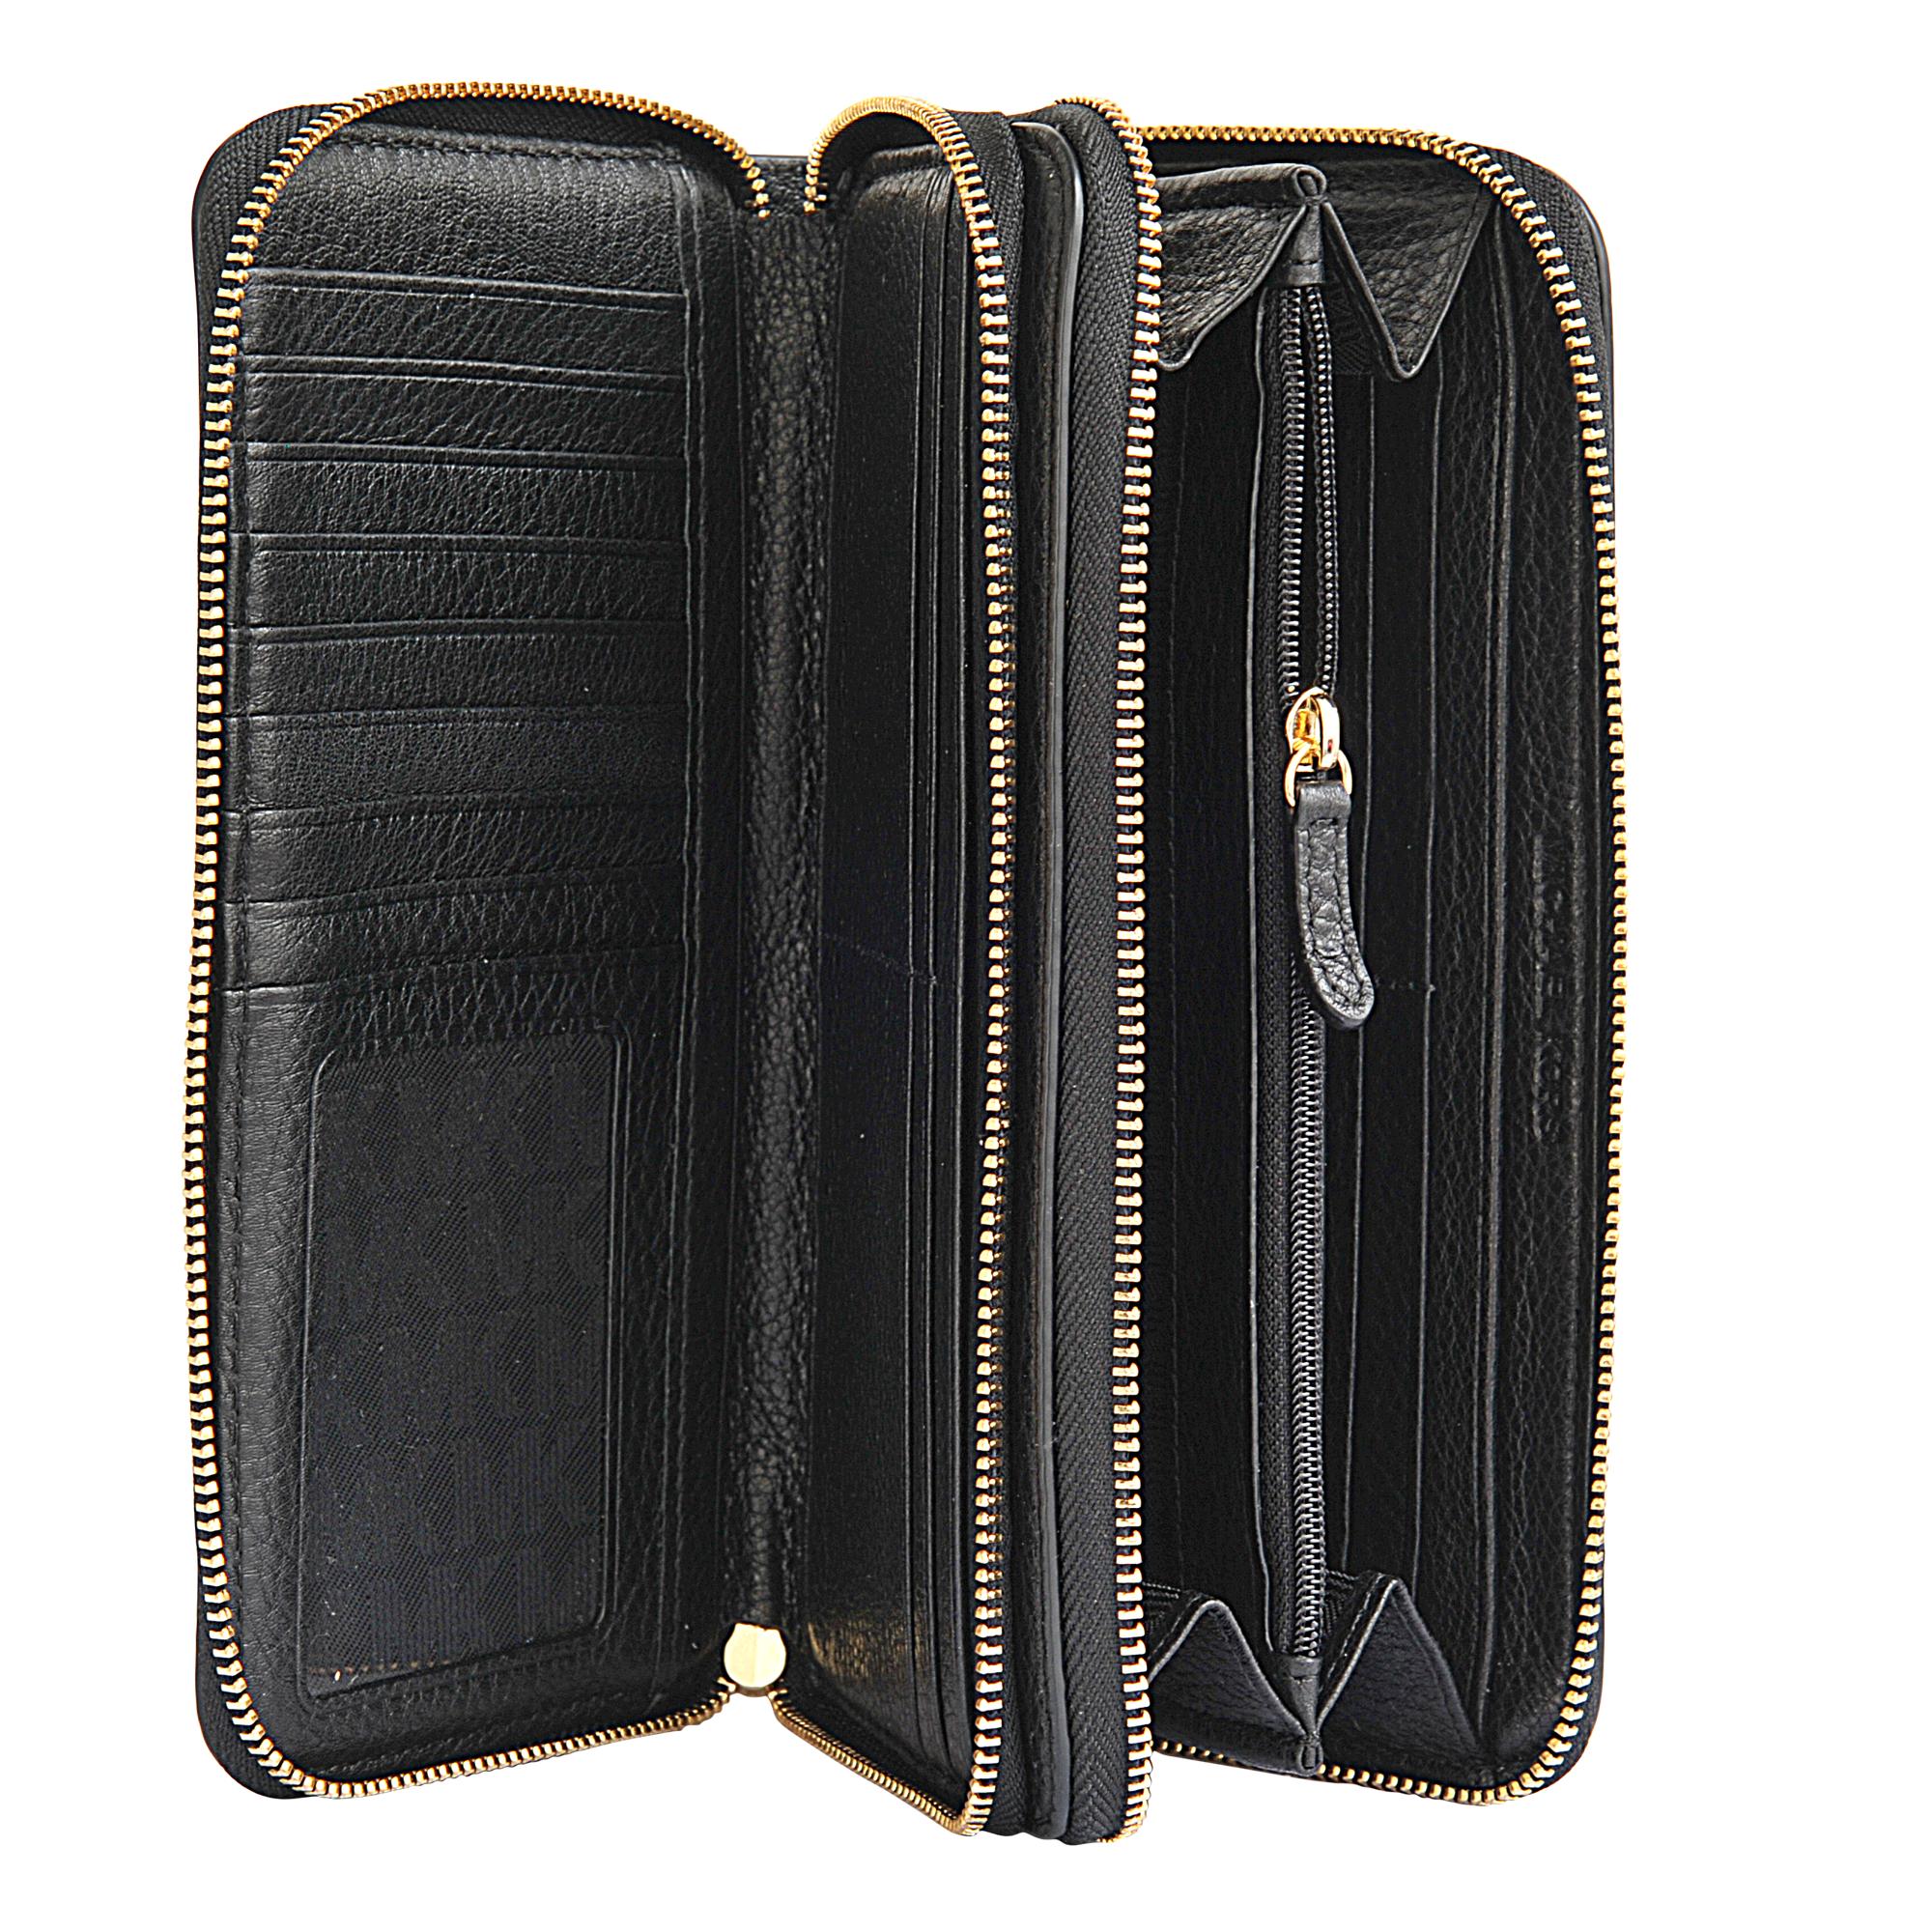 michael michael kors adele double zip wallet in black lyst. Black Bedroom Furniture Sets. Home Design Ideas